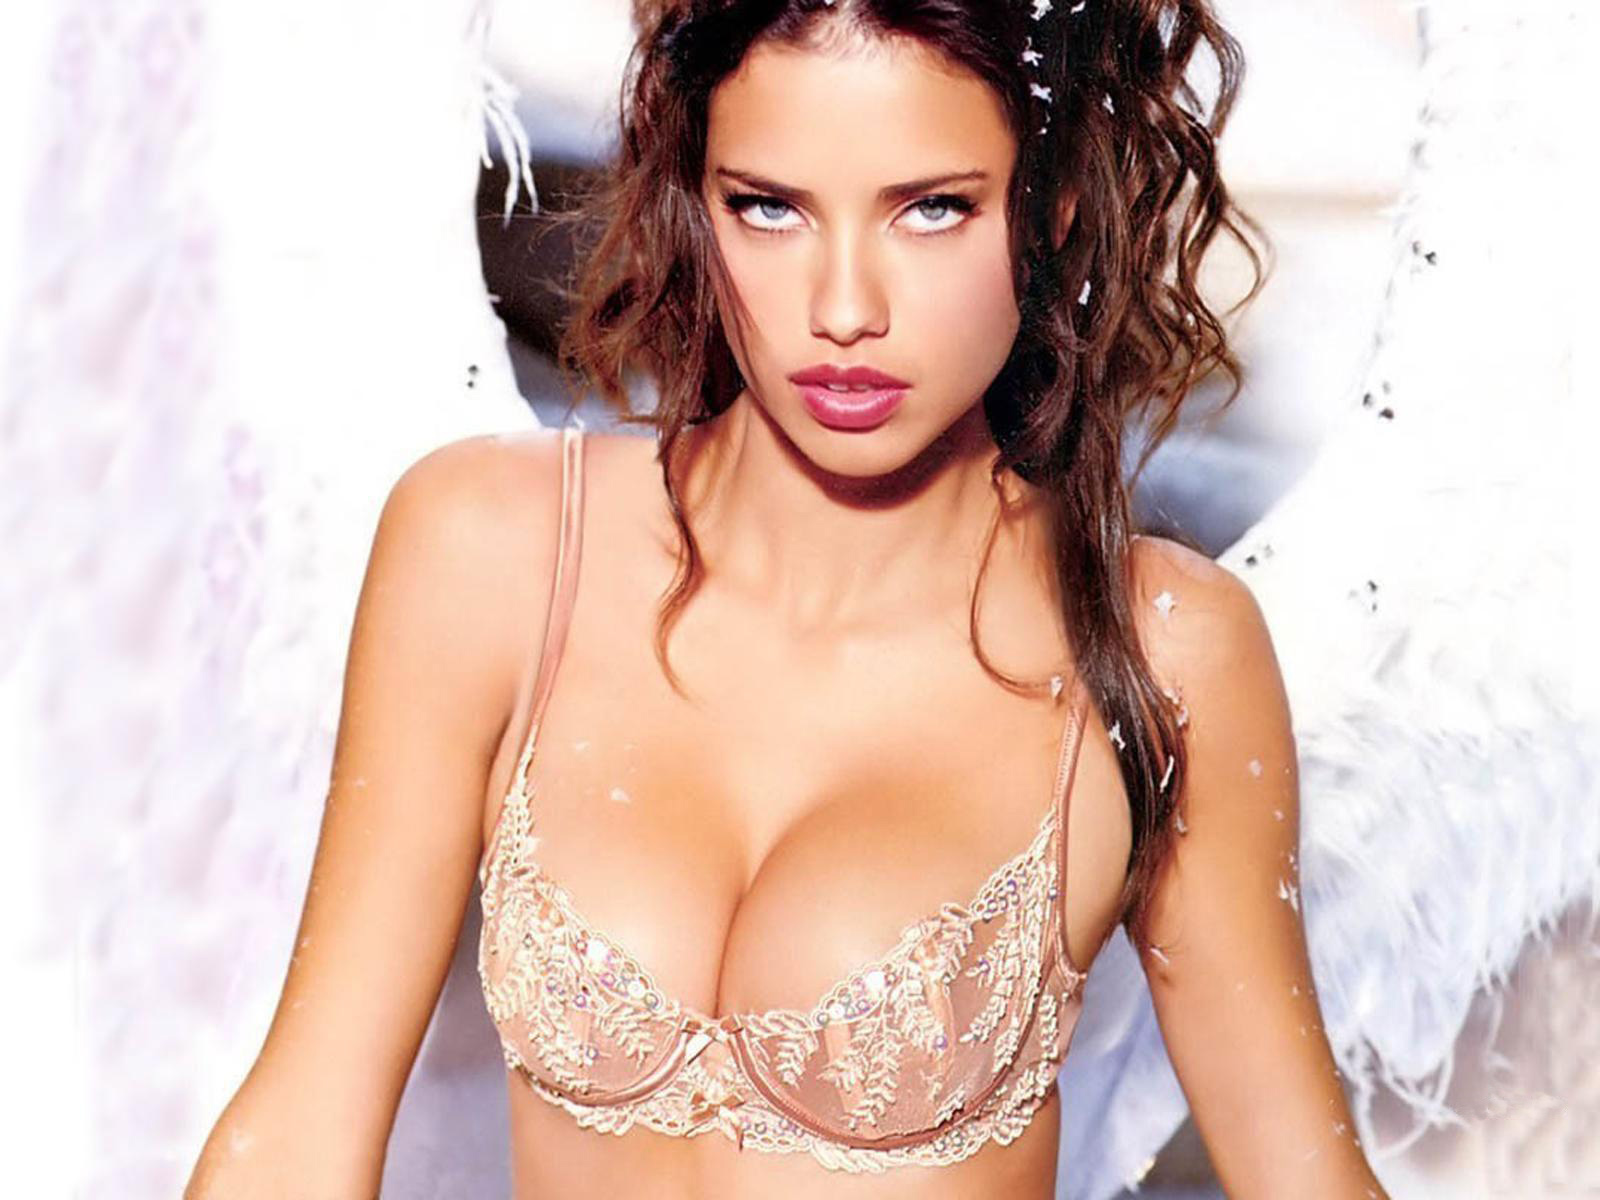 http://2.bp.blogspot.com/-UL1j4NzDcQo/Tblg152CE-I/AAAAAAAAABY/KBaRcaM4x-M/s1600/Adriana-Lima-wallpapers.jpg